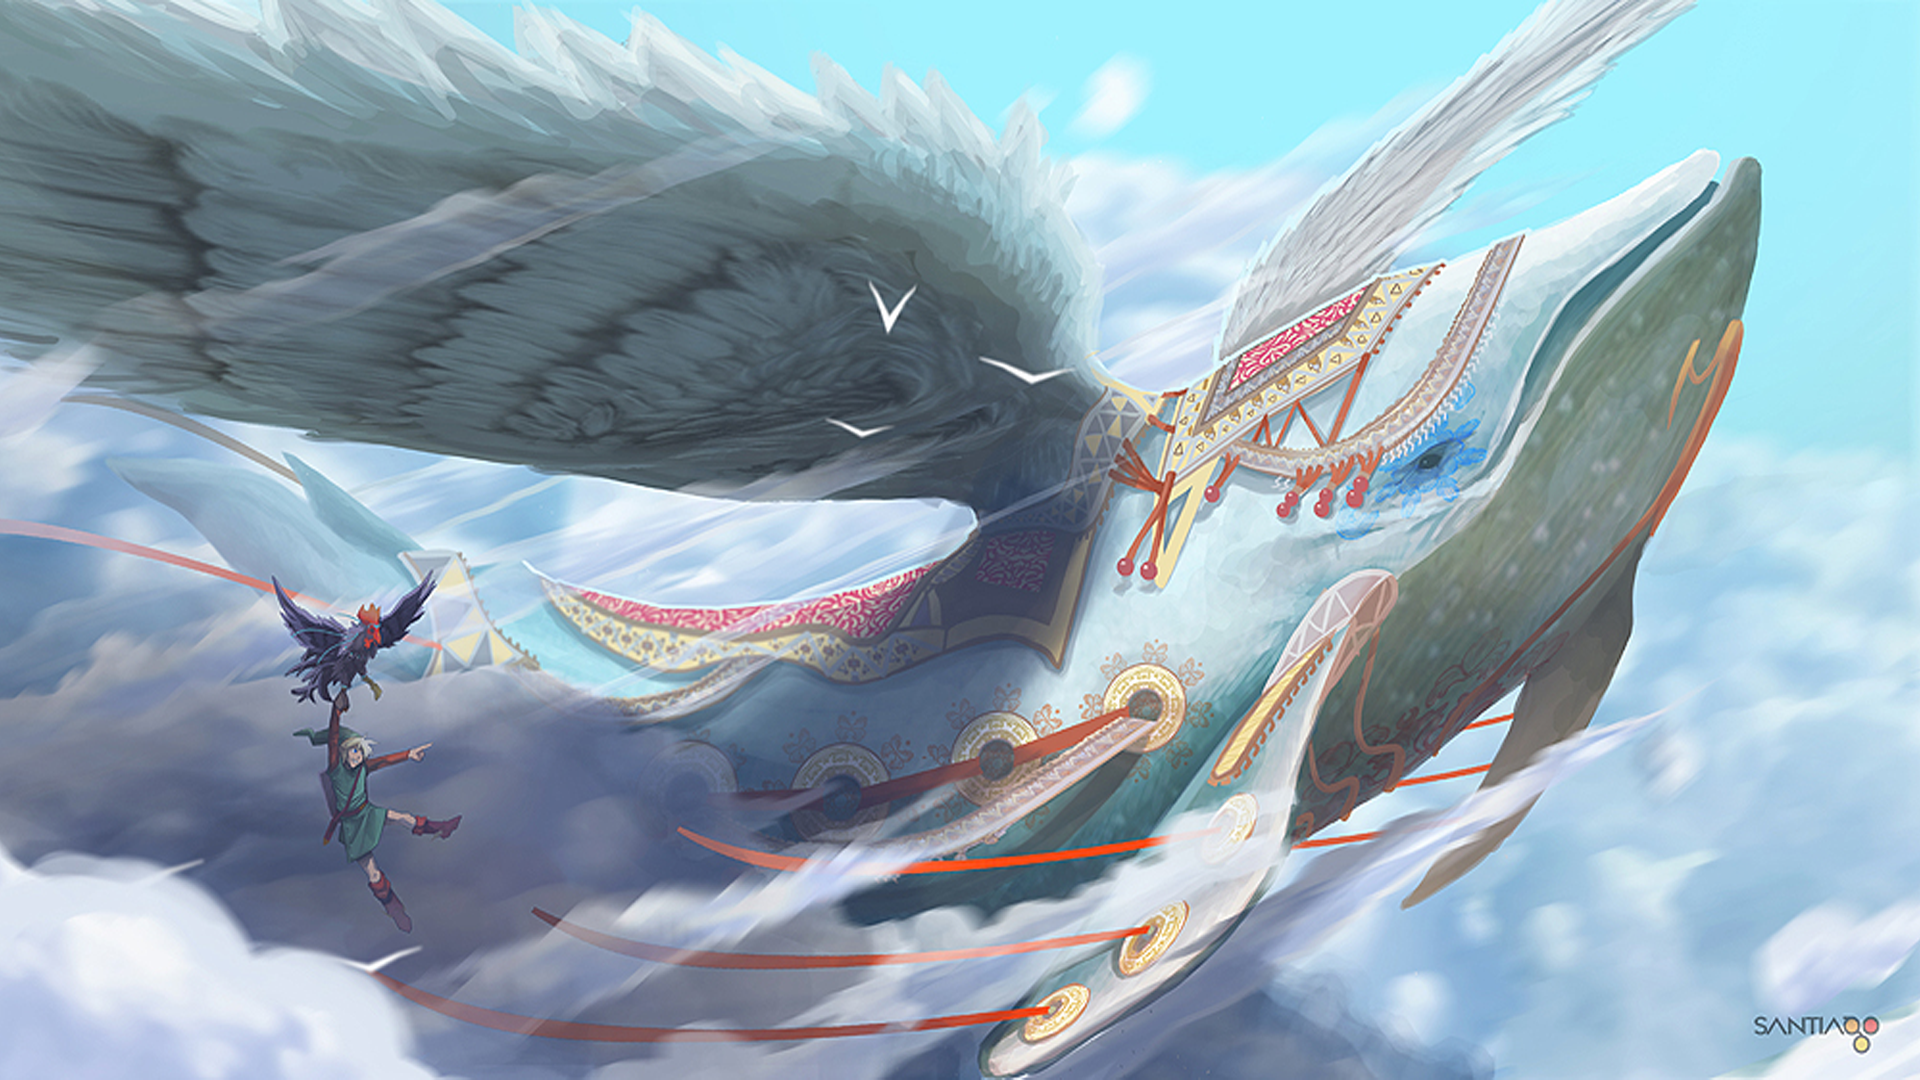 Free Download 177 The Legend Of Zelda Skyward Sword Wallpapers For